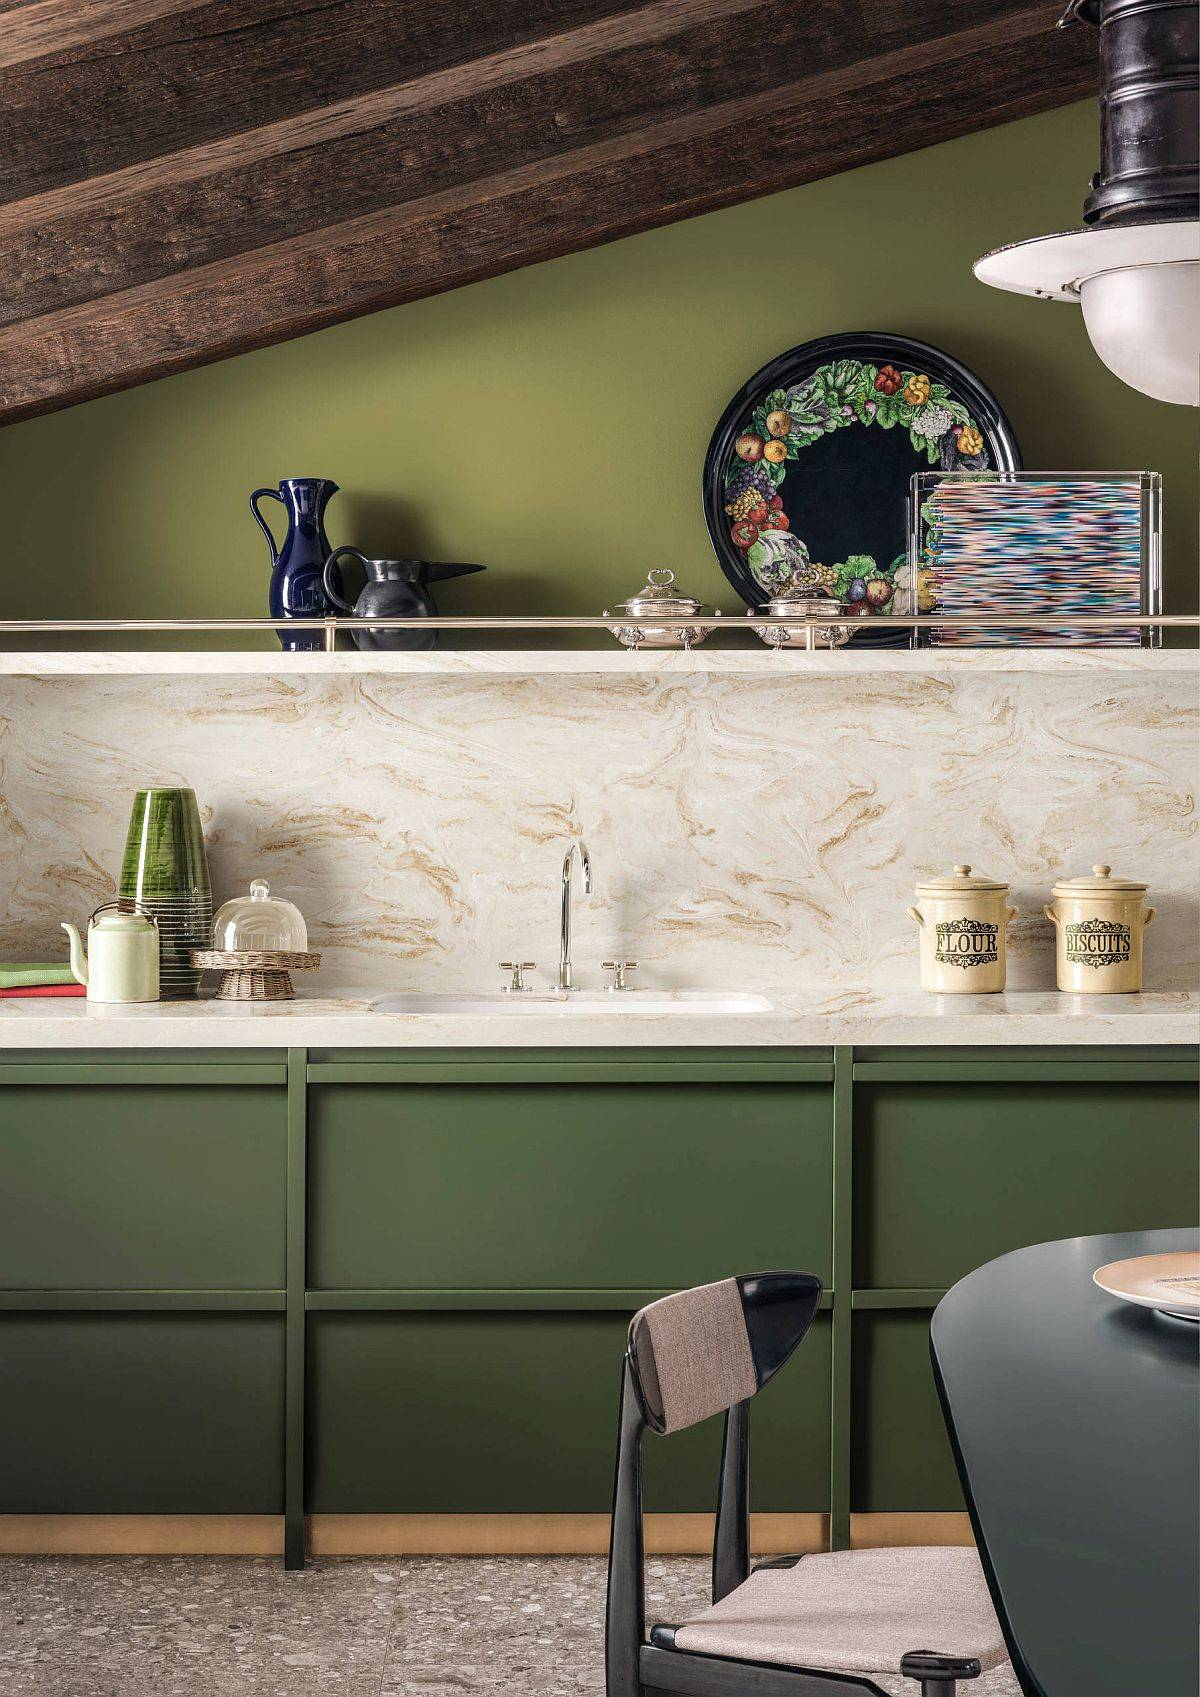 Fabulous-midcentury-modern-kitchen-in-green-with-white-backsplash-34271